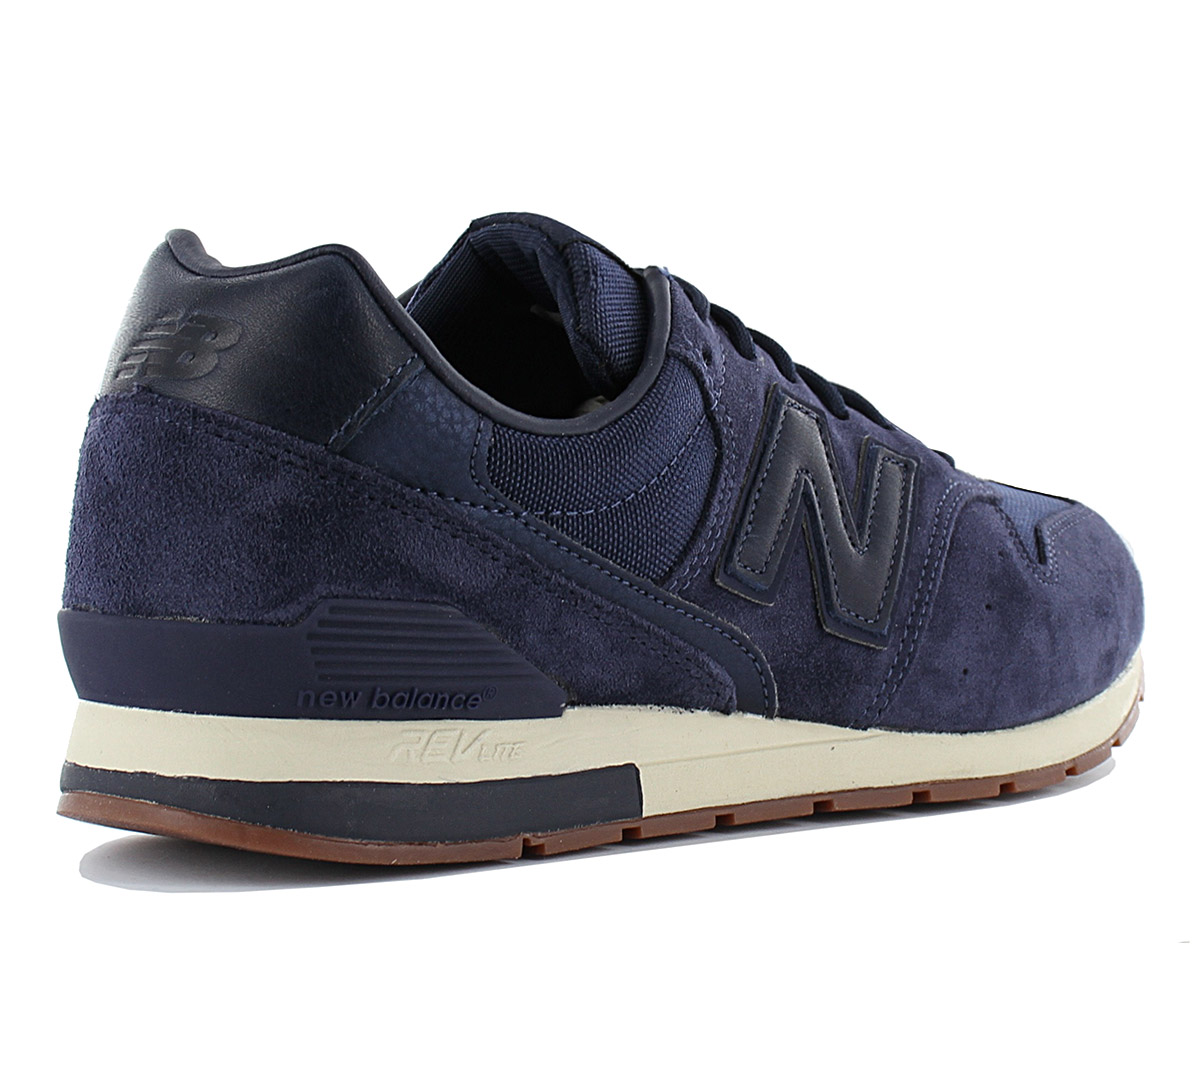 watch 3b6be 91748 Details about New Balance Lifestyle 996 Revlite Men's Sneaker Shoe Sneaker  MRL996SE MRL996